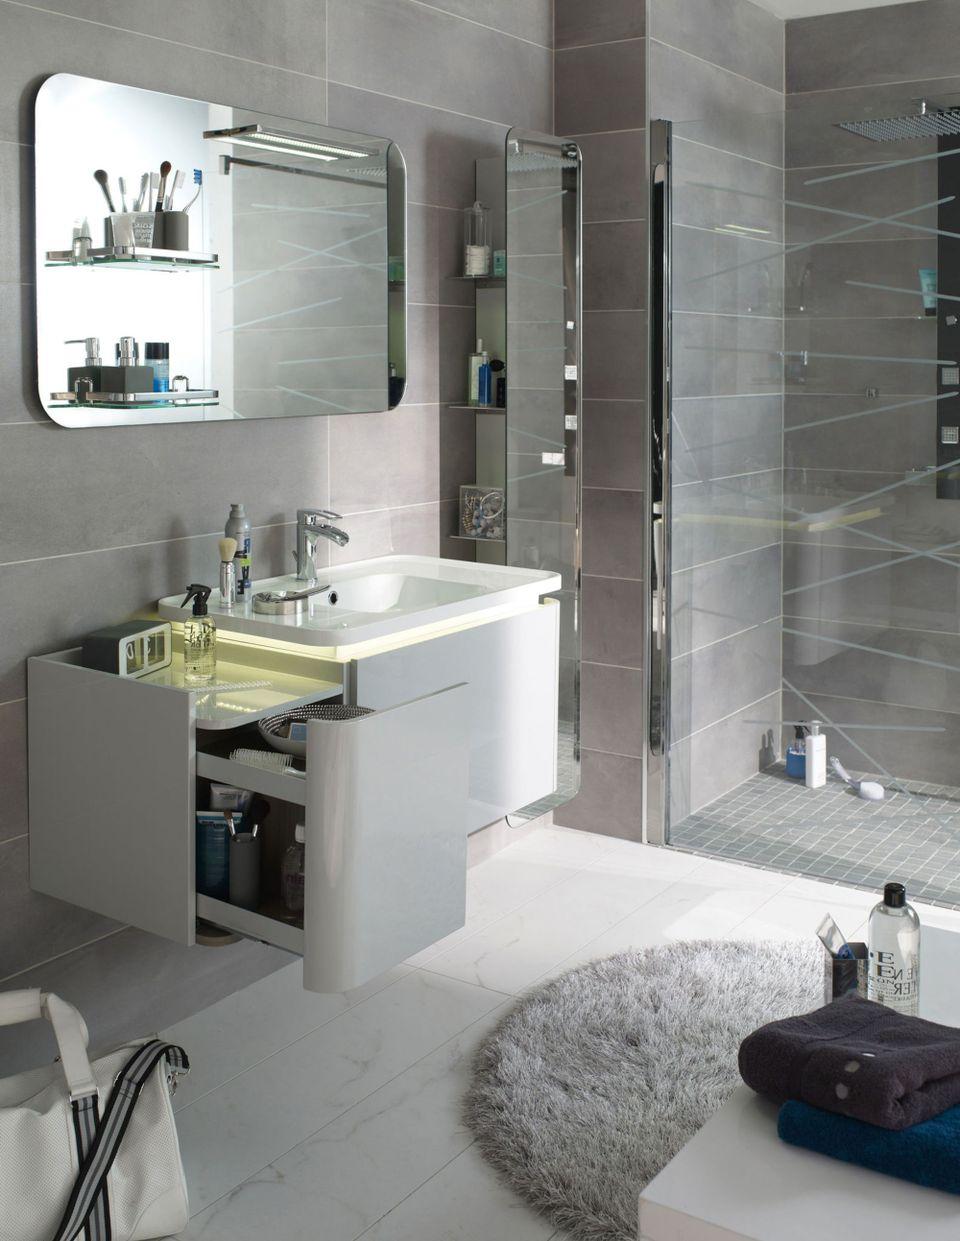 10 astuces pour am nager une petite salle de bains - Salle de bain de luxebaignoires design ...